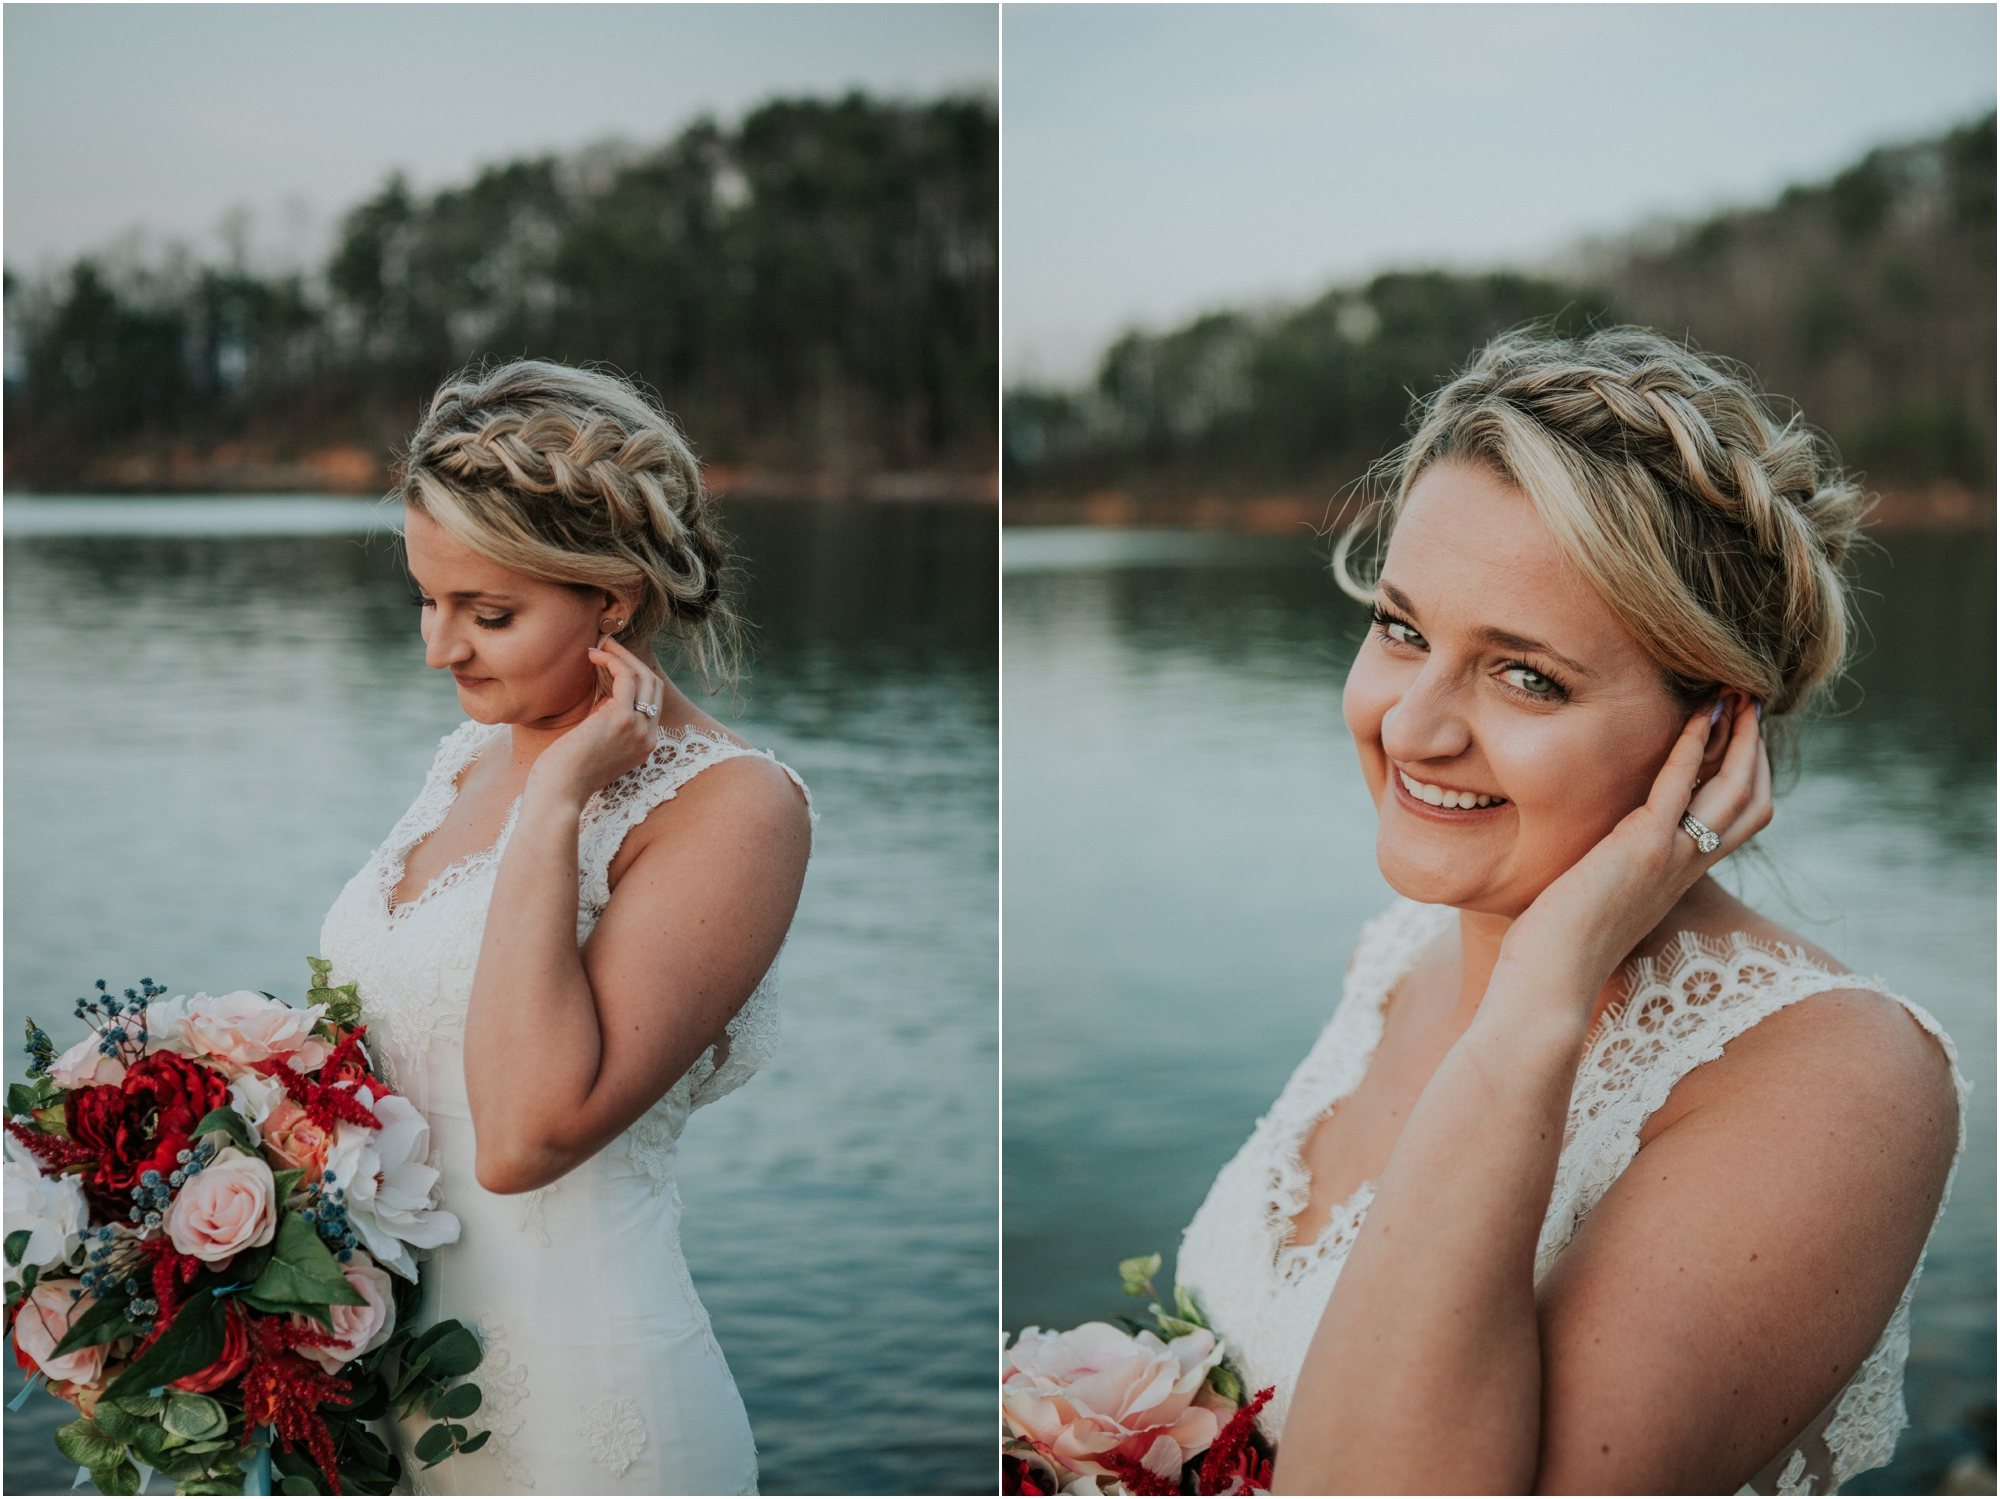 watauga-lake--bohemian-bridal-styled-session-northeast-tennessee-wedding-elopement-photography_0017.jpg